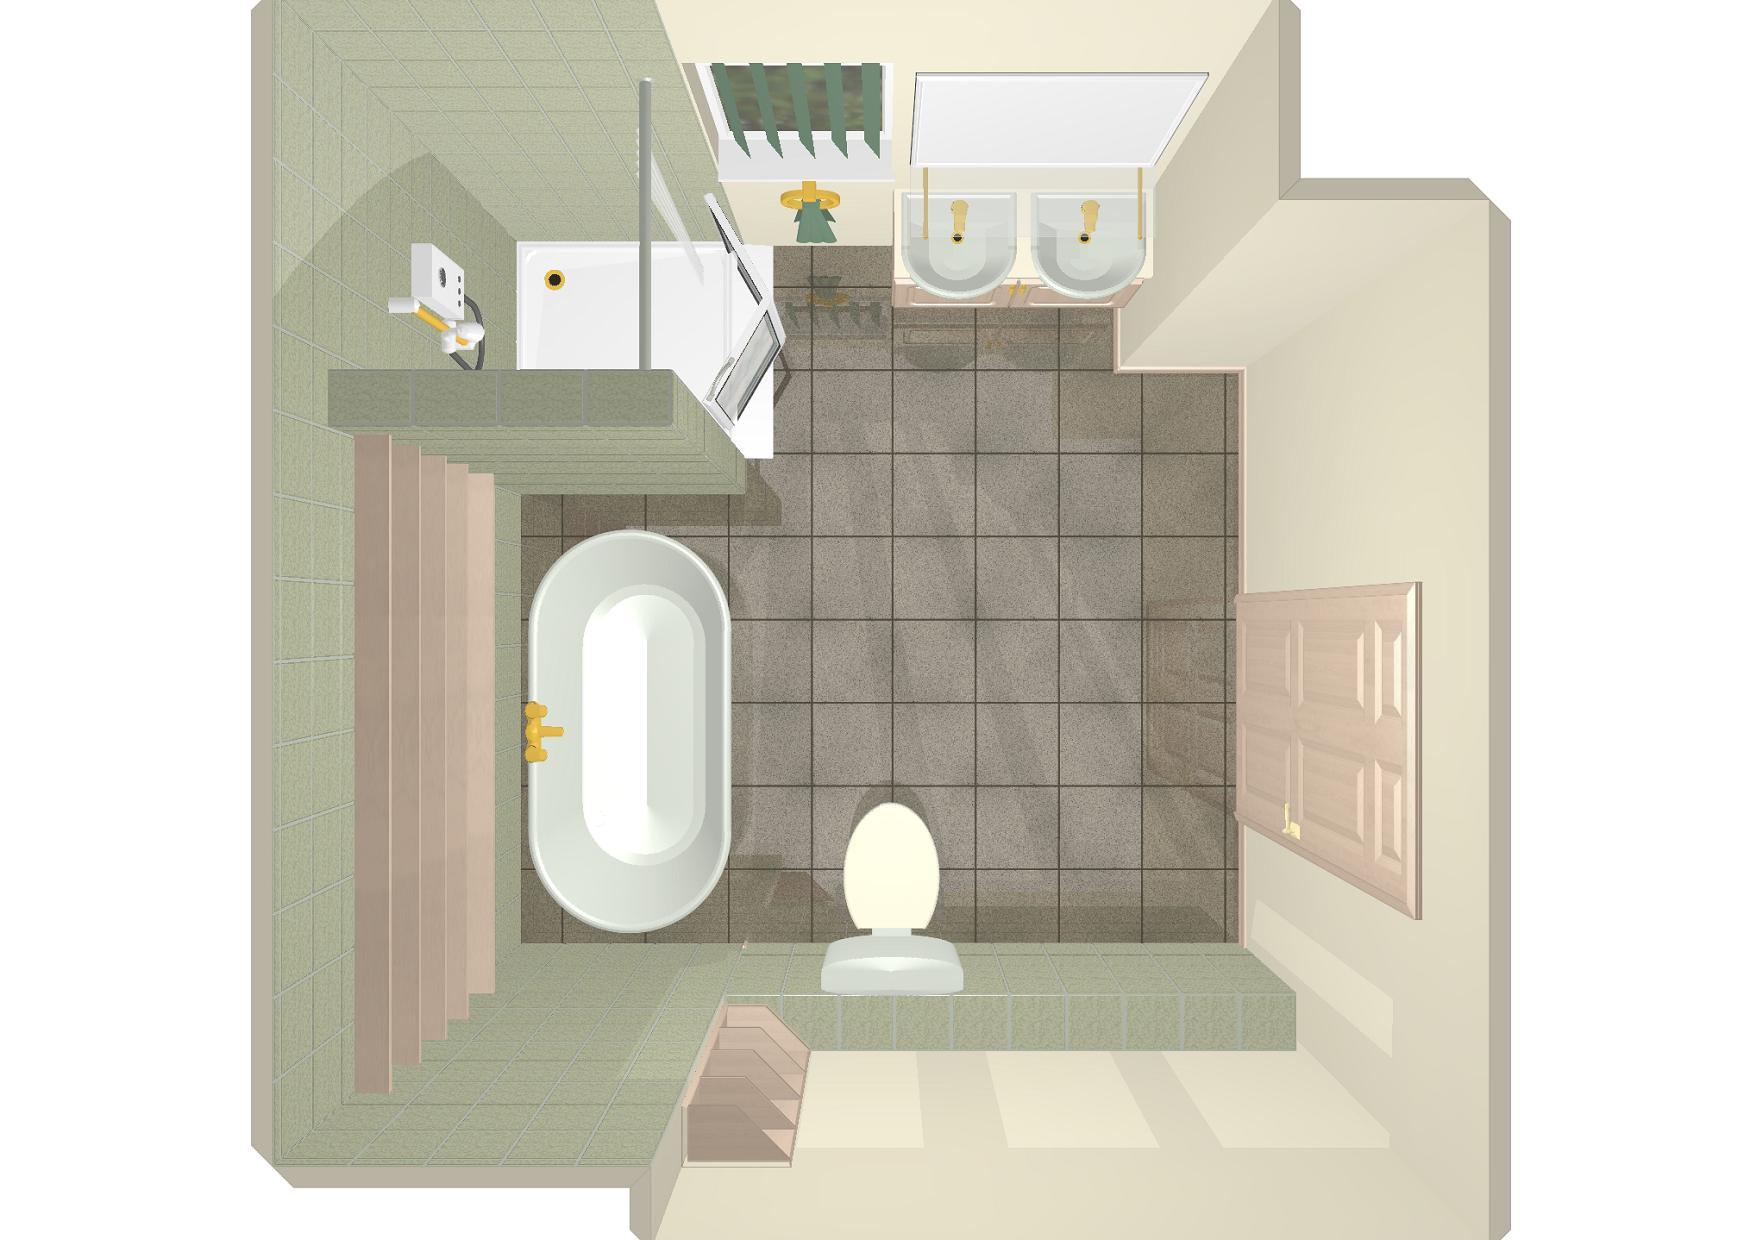 Cad gallery 3d birds eye image of dual use mobility bathroom - Image of bathroom ...